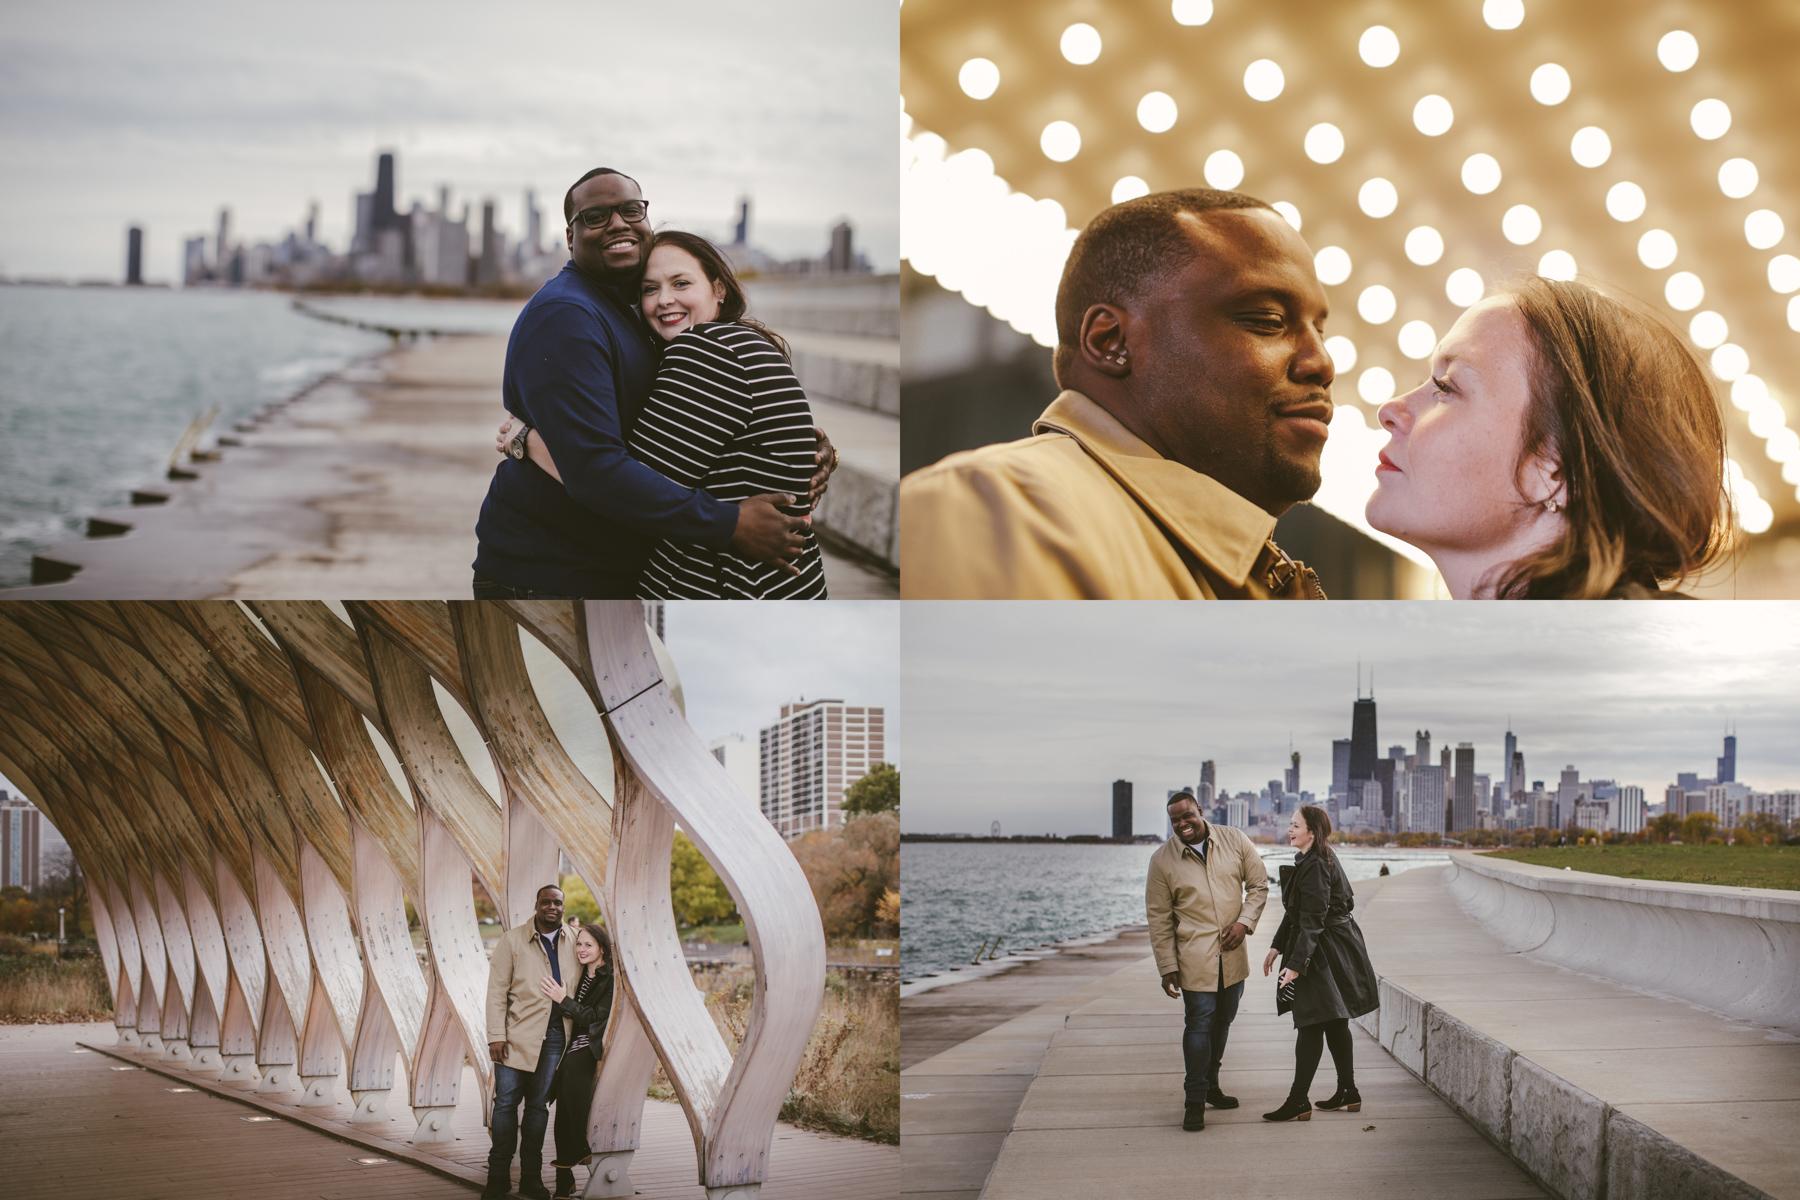 008 vicky-alex-chicago-engagement.jpg